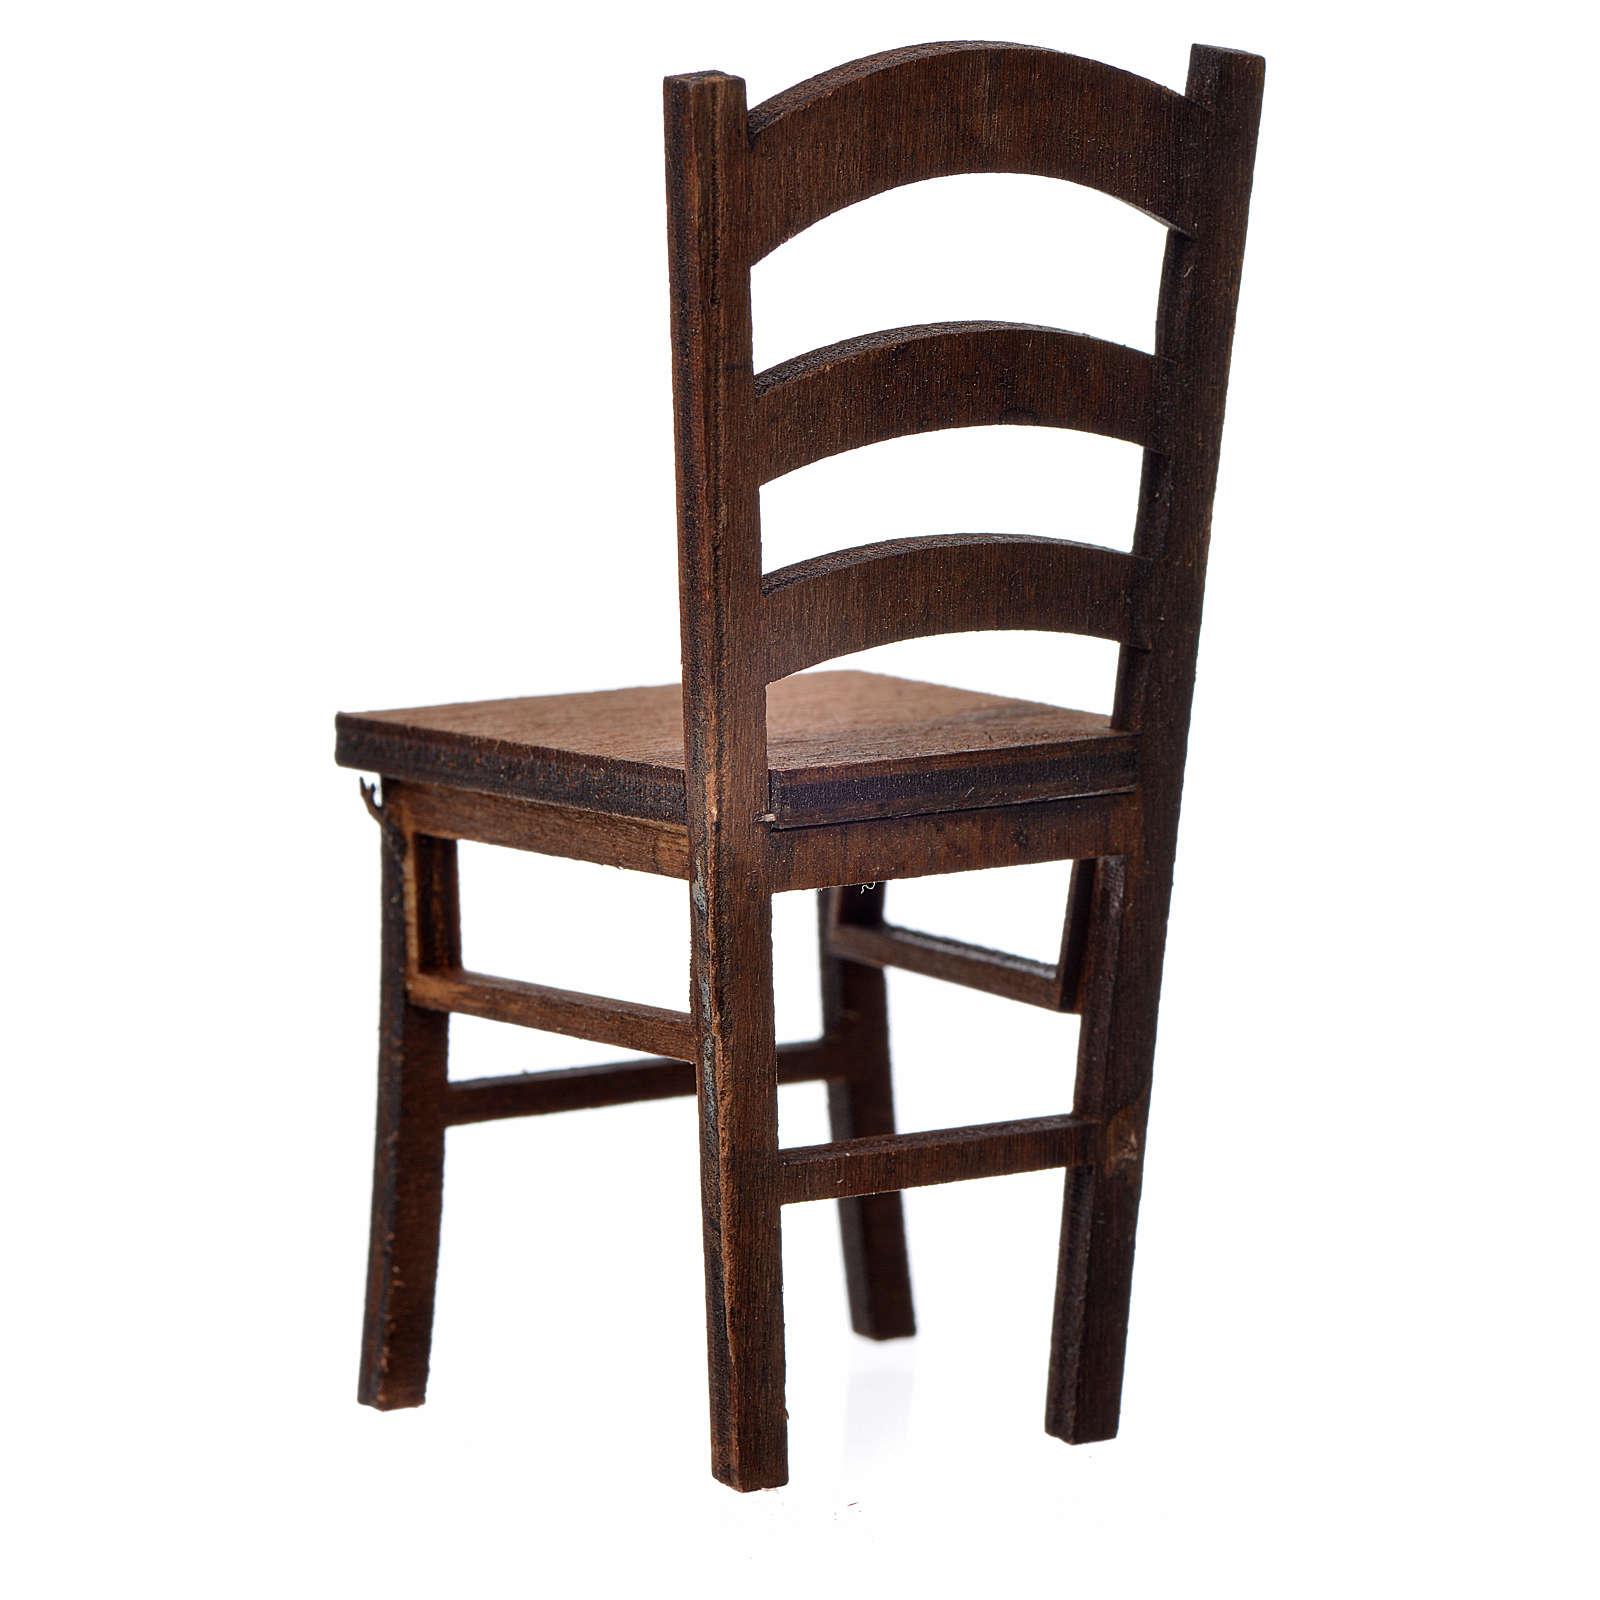 Chaise en bois en miniature 7,5x3,5x3,5 4